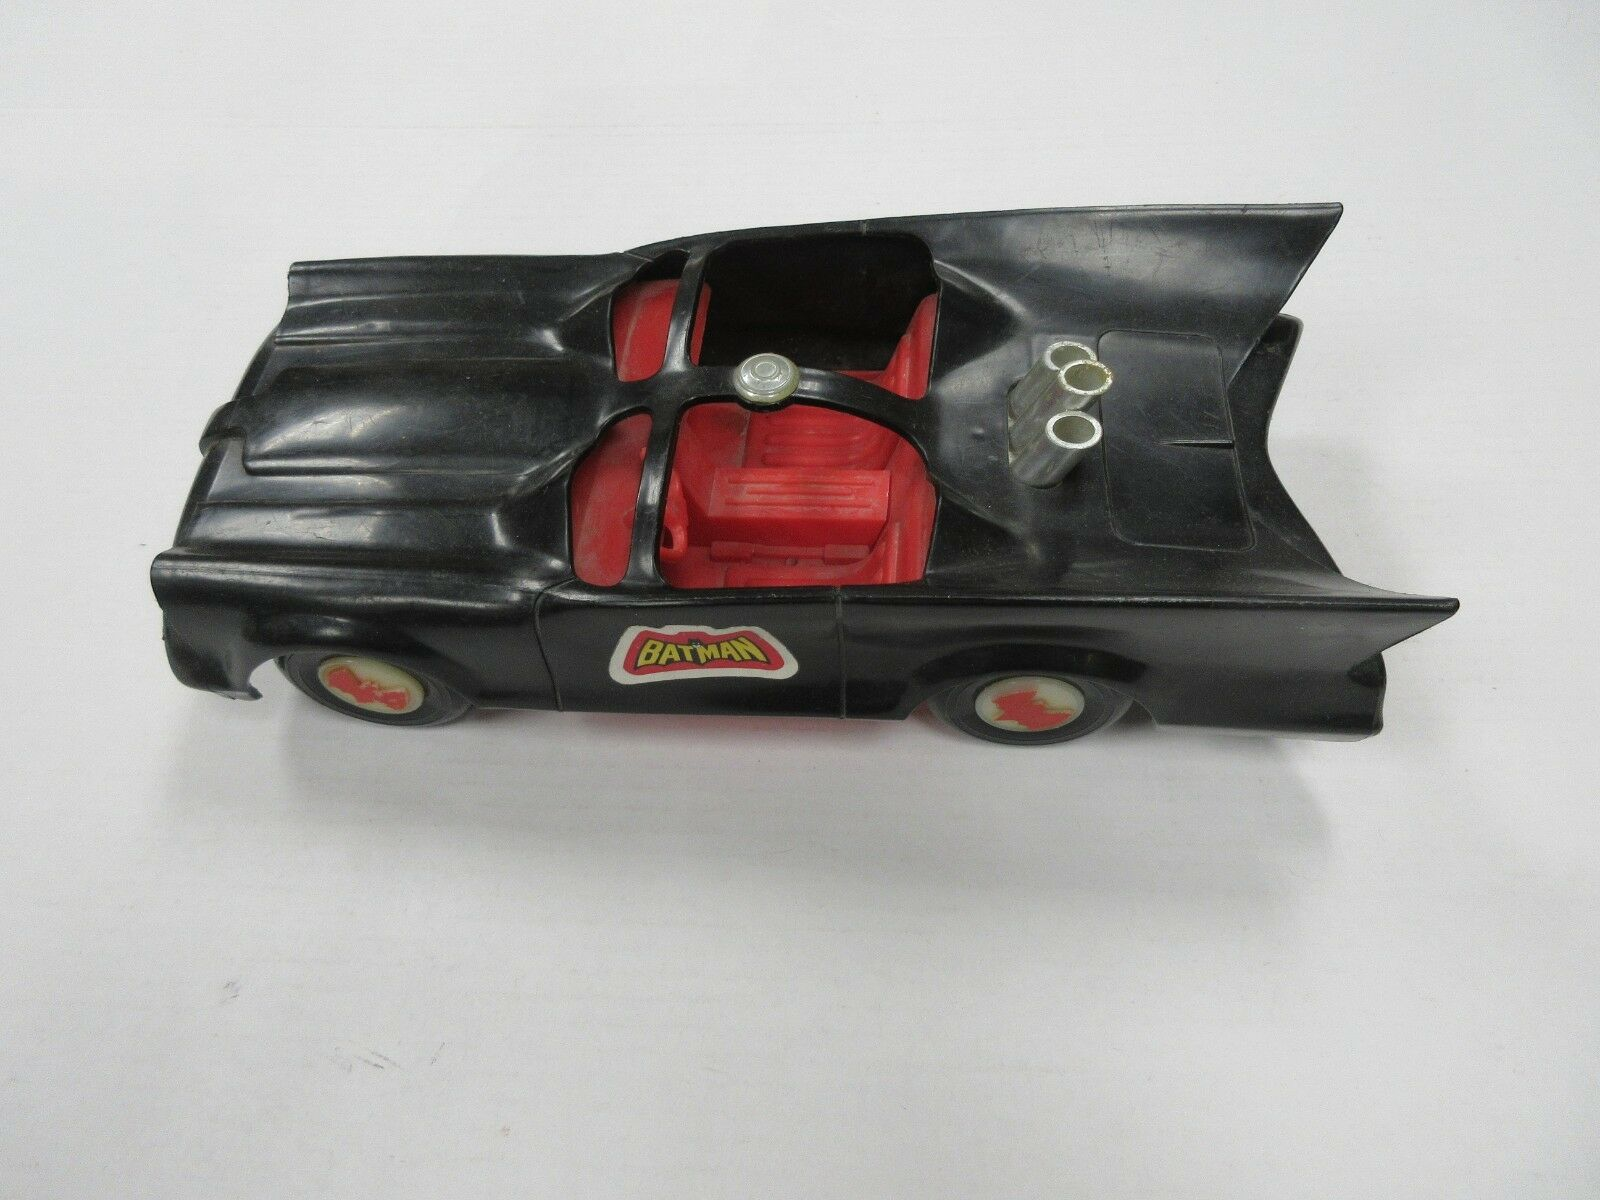 1974 MEGO WGSH BATMAN 8  INCH FIGURE BATMOBILE VEHICLE